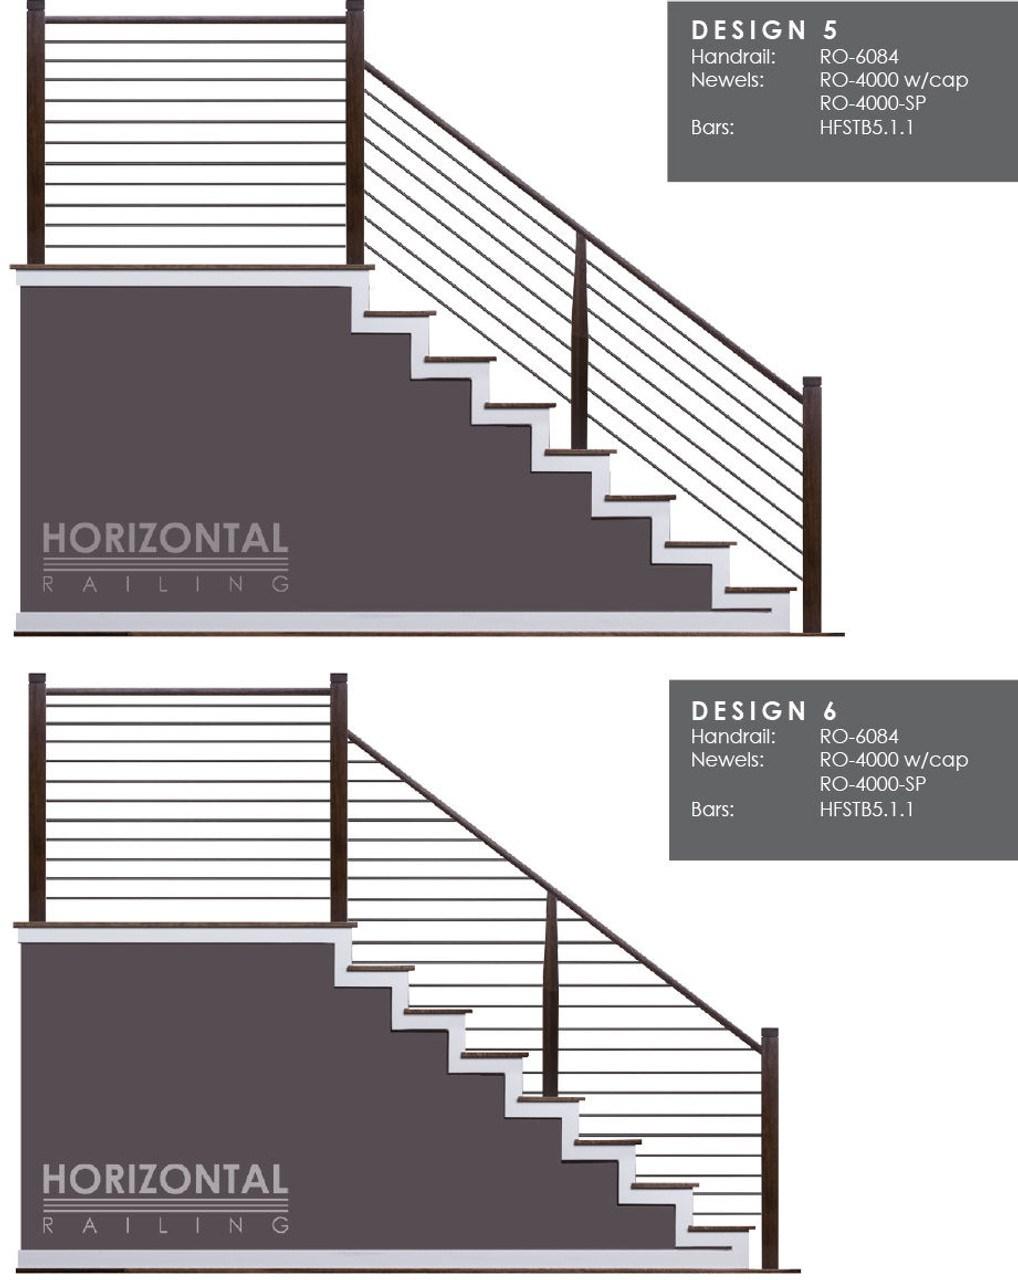 Hf5 1 1 Horizontal Railings And Bars Westfire Stair Parts | Tubular Stair Railings Design | Simple | Grill Work | Residential Industrial Stair | Welded | Stair Case Railing